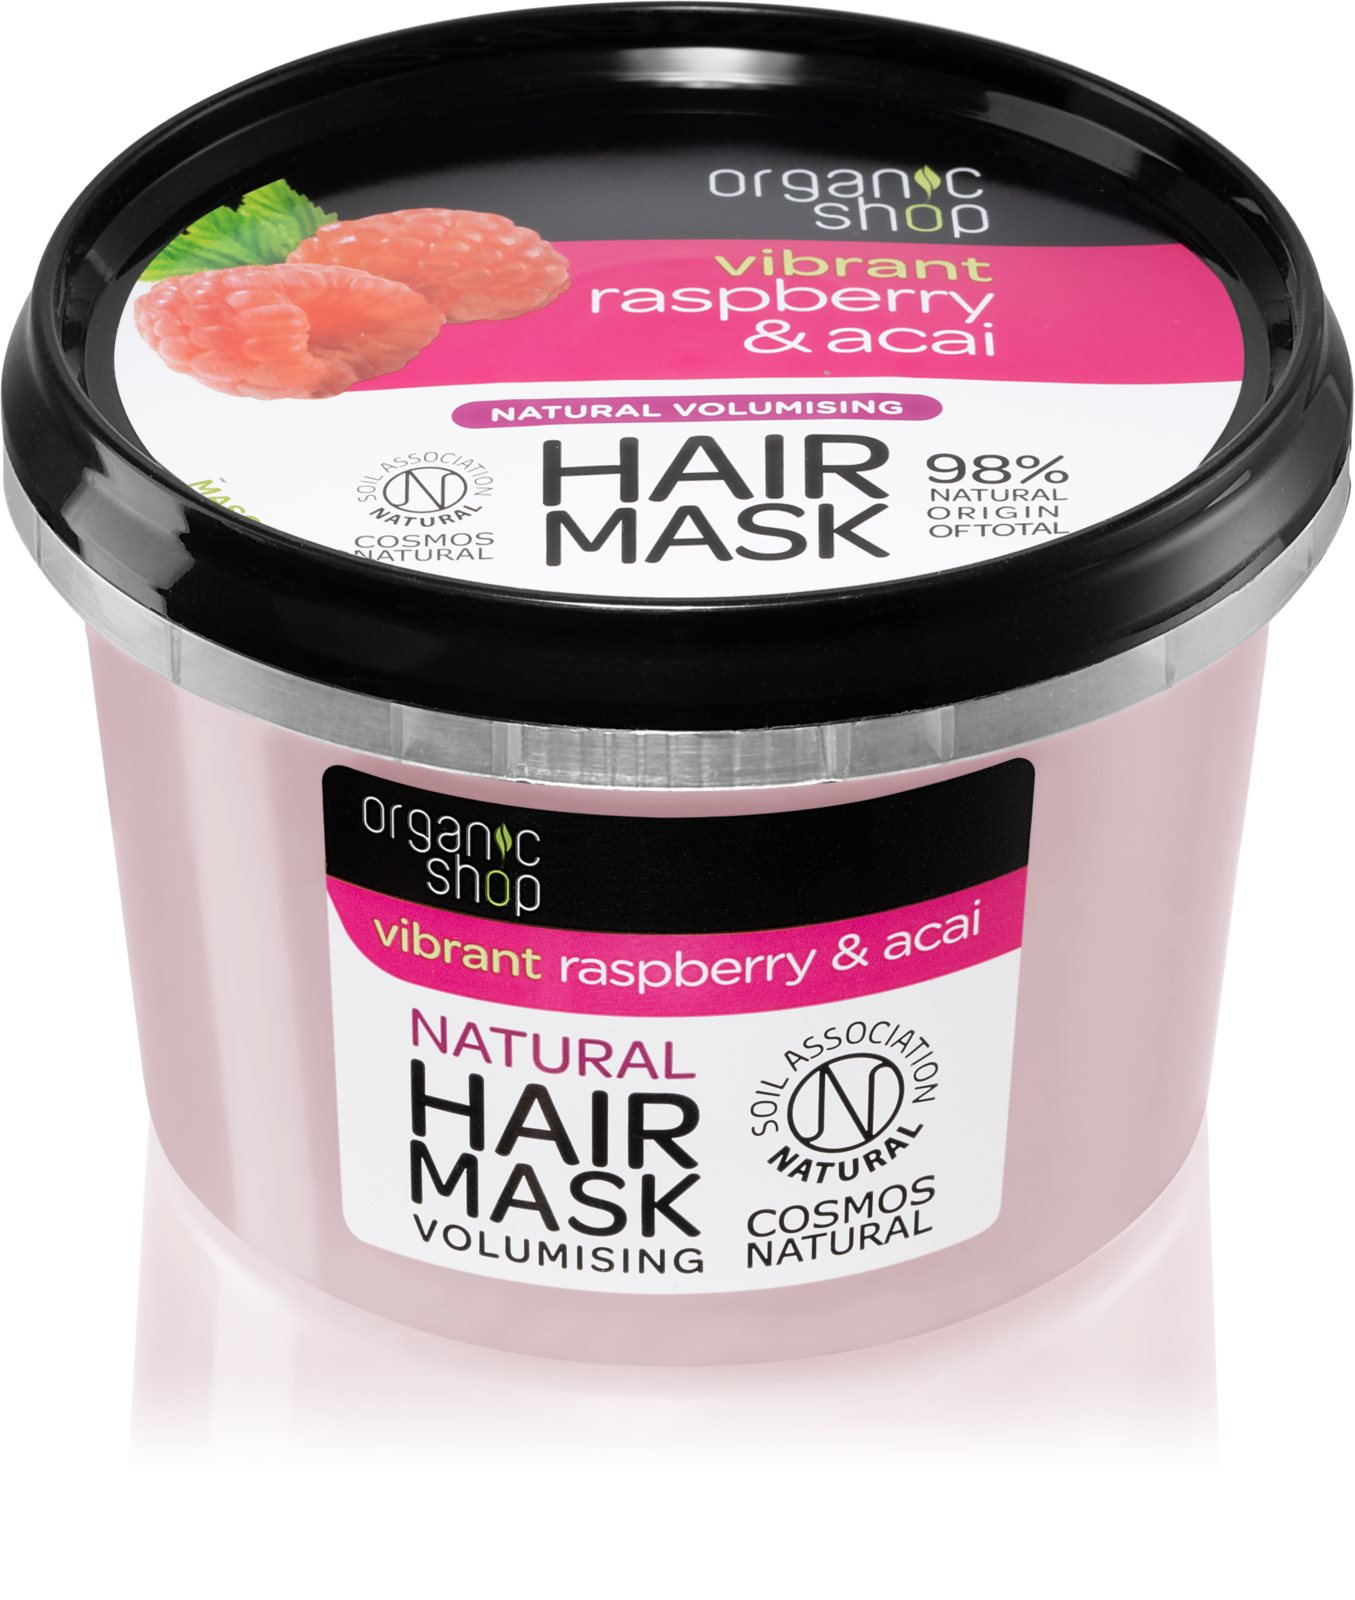 organic-shop-vibrant-raspberry-acai-vyzivujici-maska-na-vlasy_